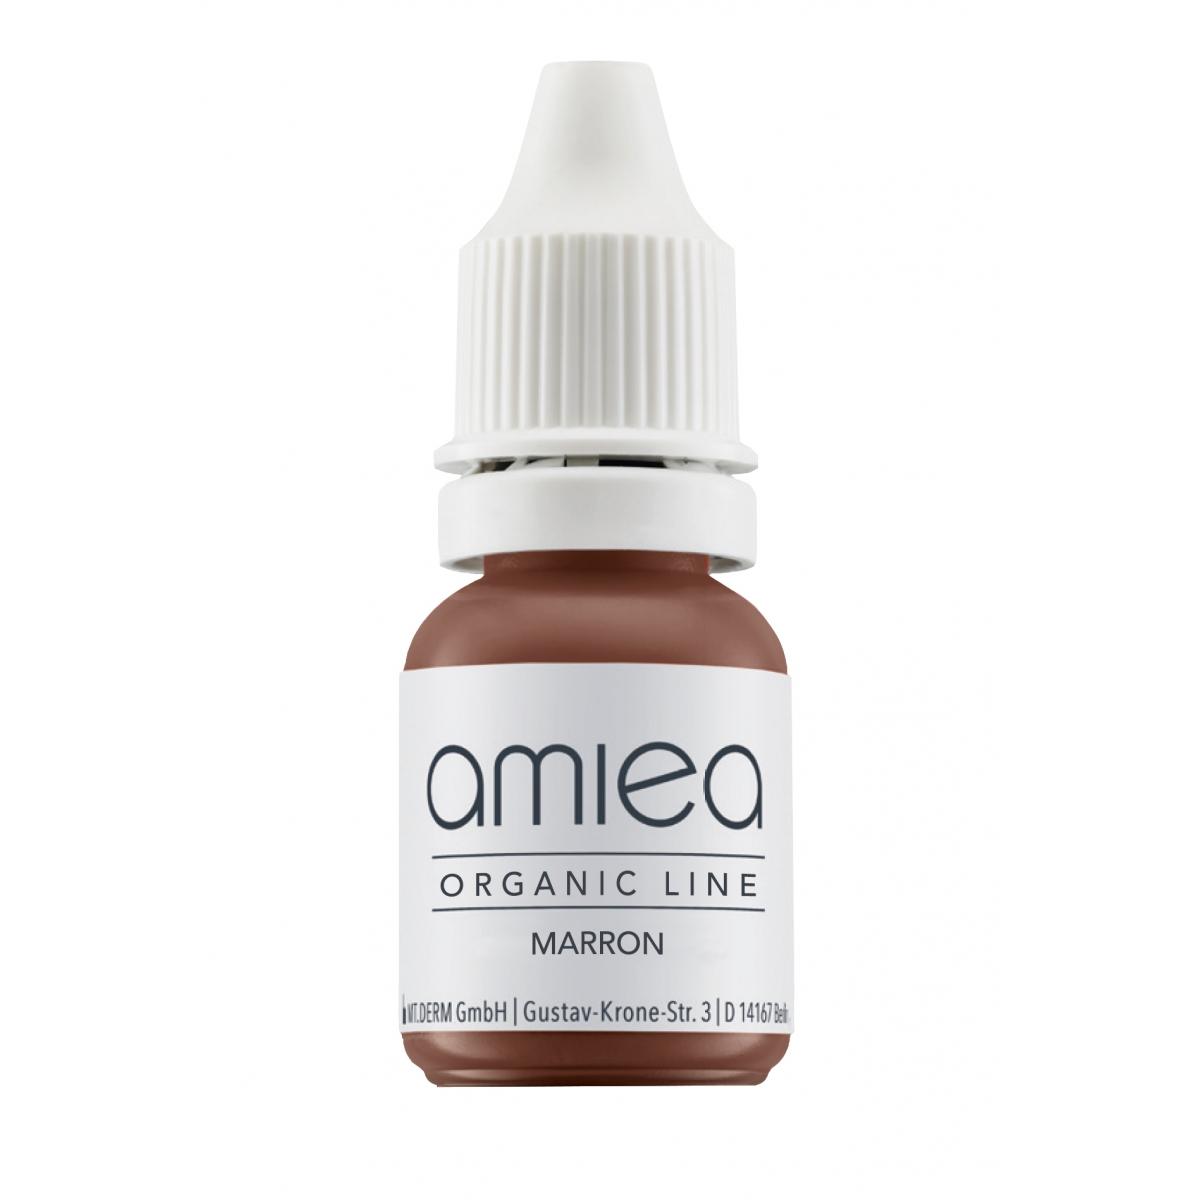 Organicline (10 ml) - PIGMENTS AMIEA ORGANICLINE MARRON, Flacon 10 ml